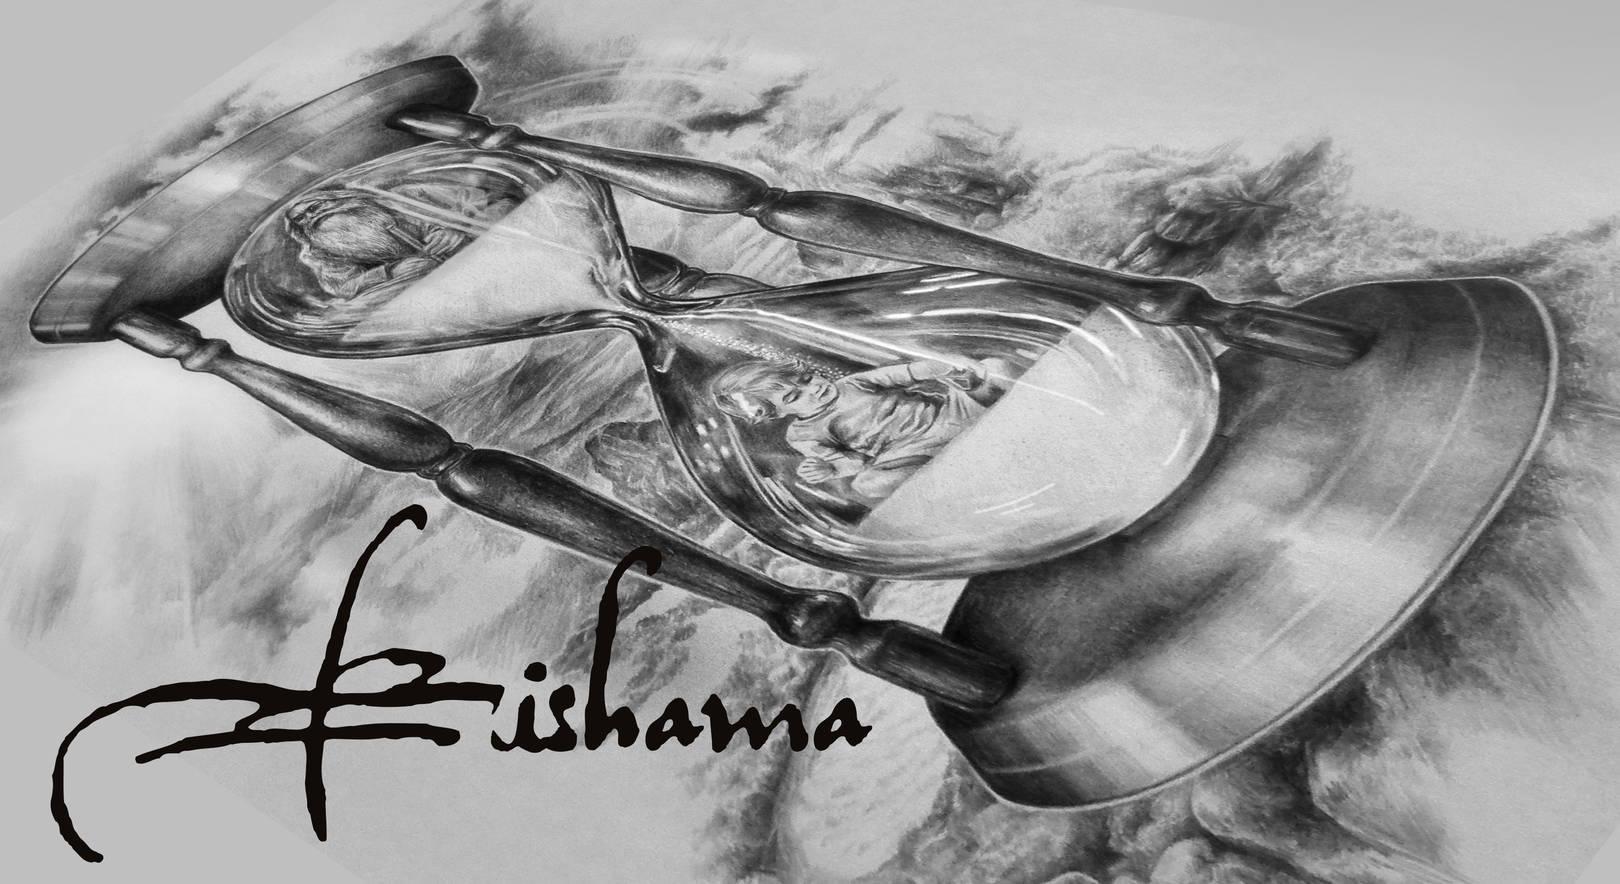 RISHAMA ART